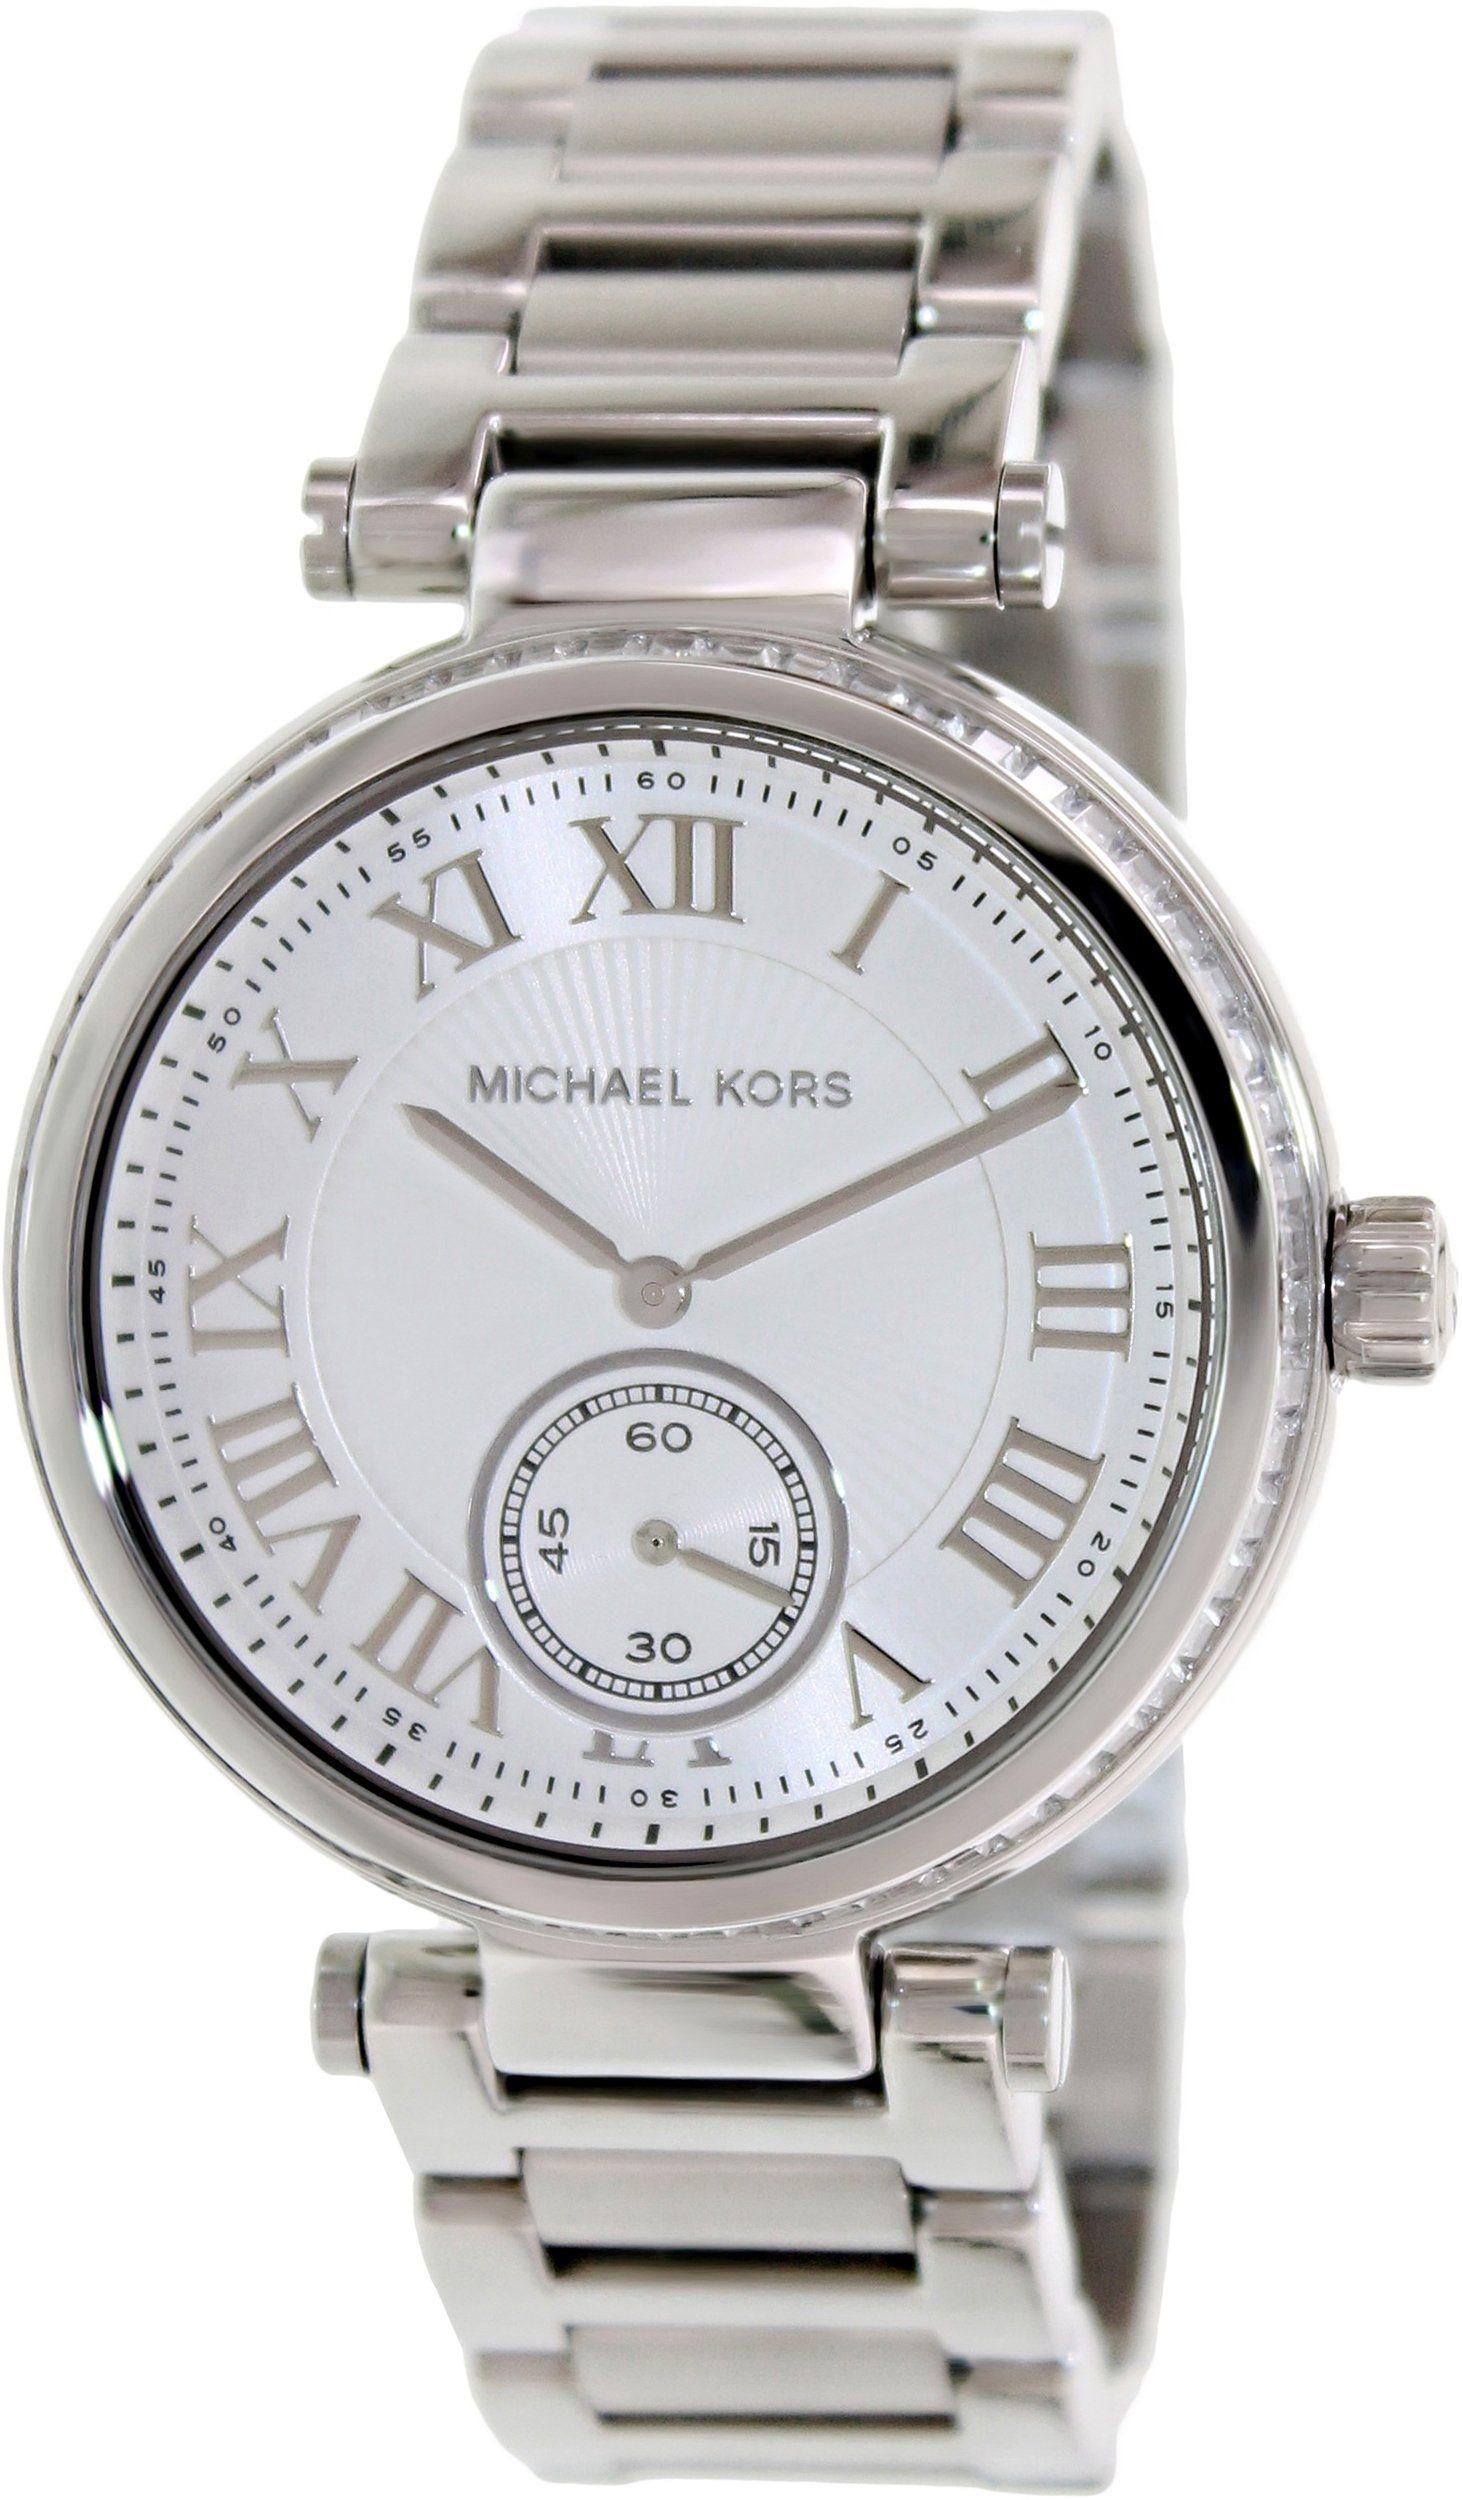 be74e066fc00 Michael Kors Skylar Silver Dial Stainless Steel Ladies Watch MK5866 ...